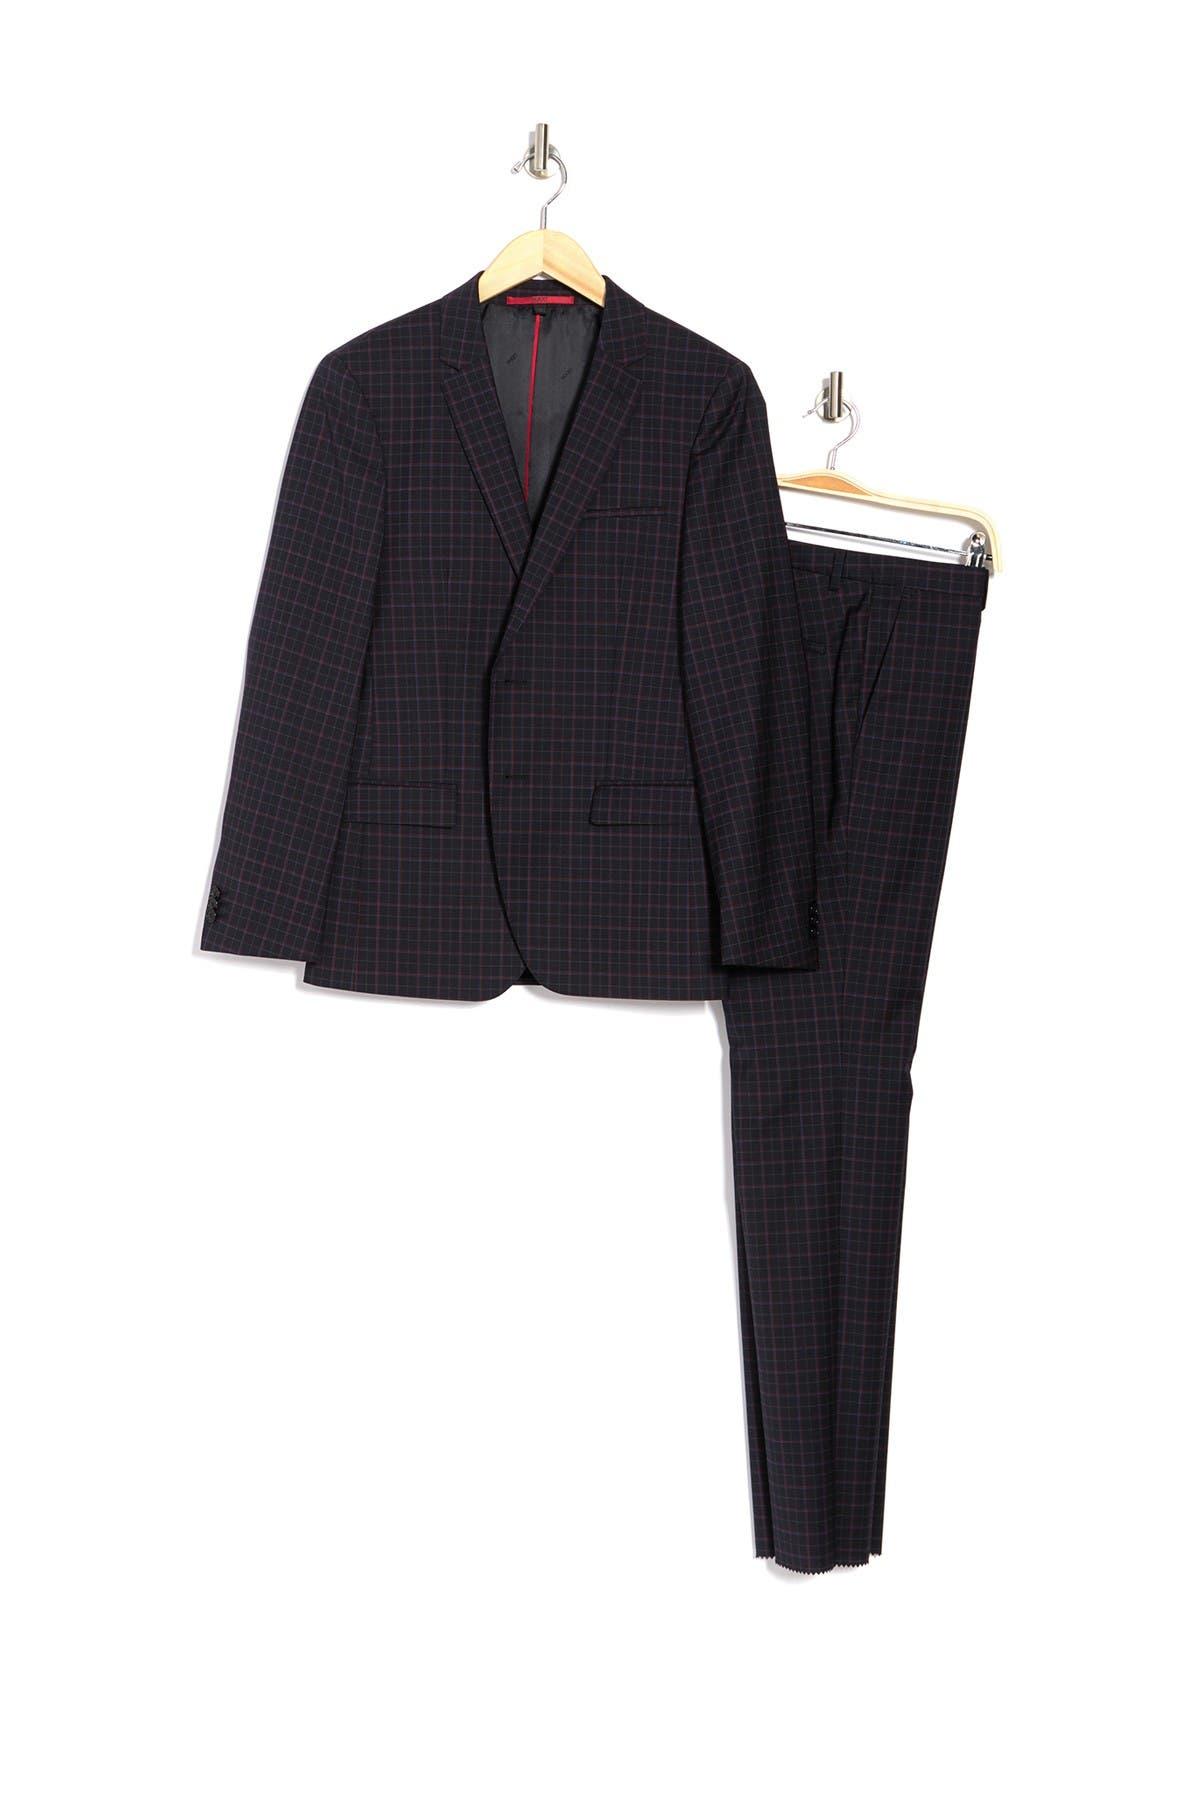 Image of BOSS Tattersall Print Two Button Notch Lapel Wool Suit